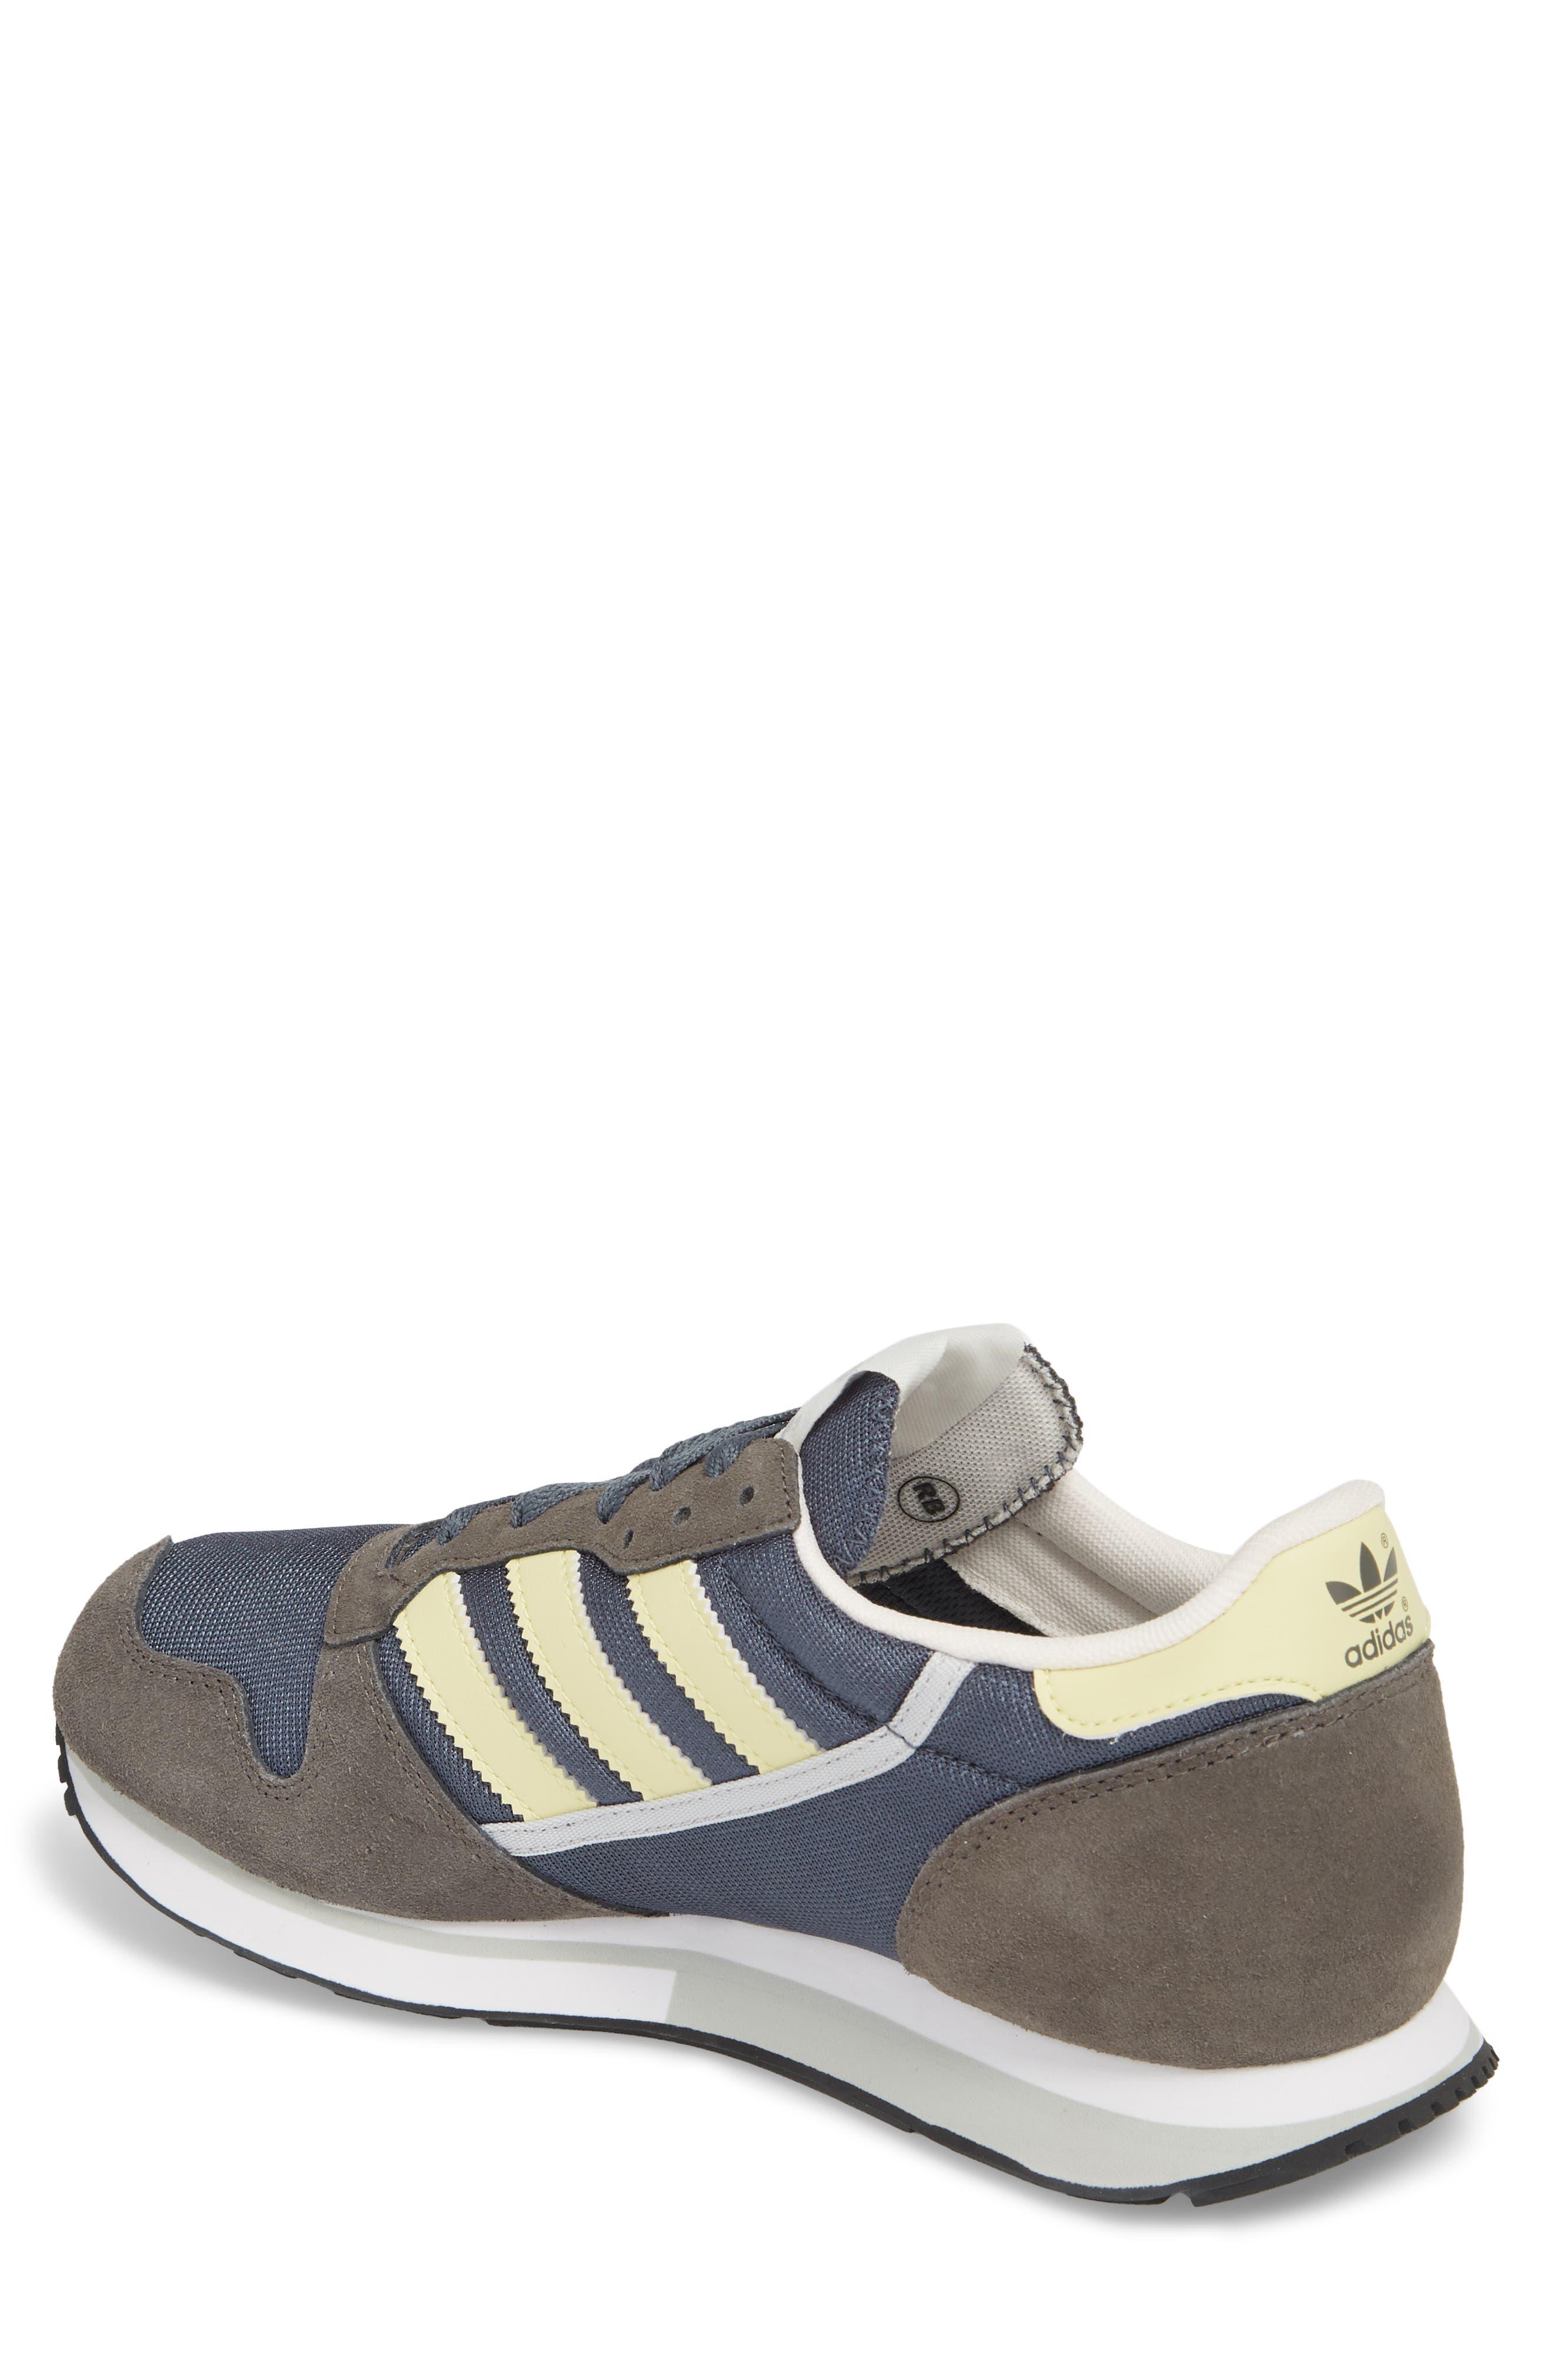 ZX 280 SPZL Sneaker,                             Alternate thumbnail 2, color,                             WHITE/ GREY/ WHITE